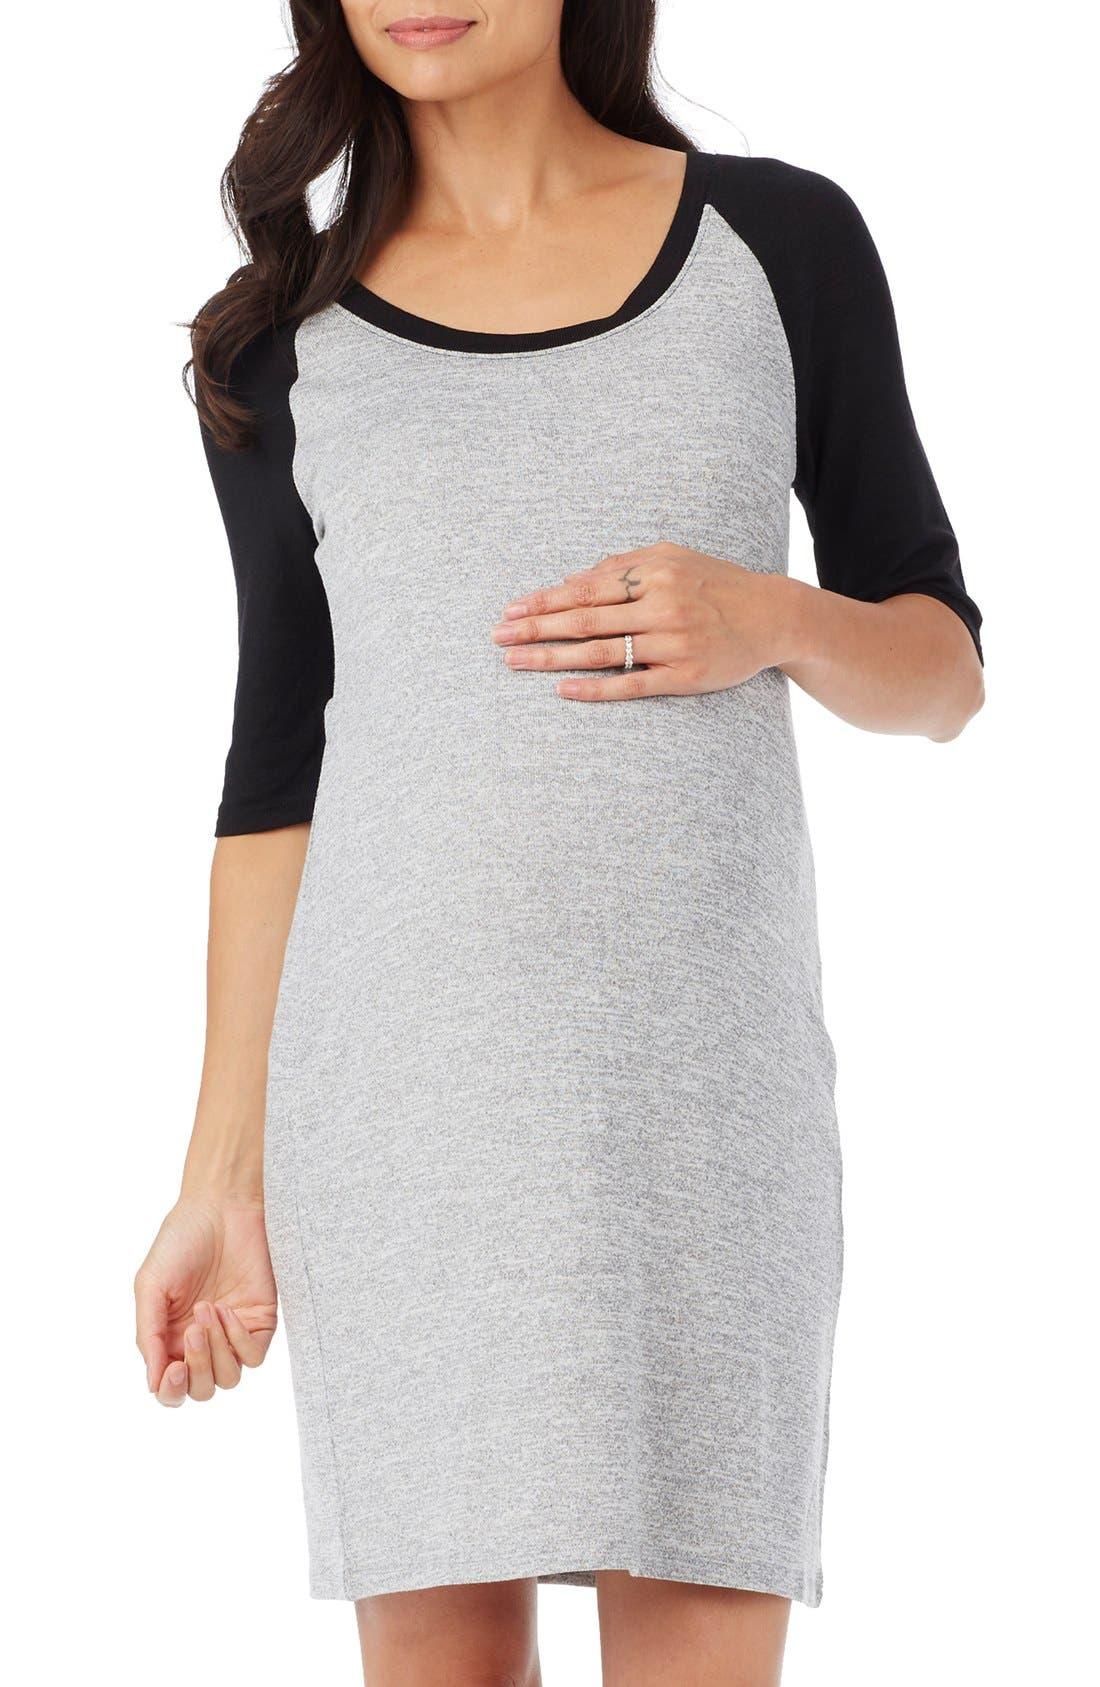 'Derek' Raglan Sleeve Maternity Dress,                         Main,                         color, Heather Grey/ Black Combo